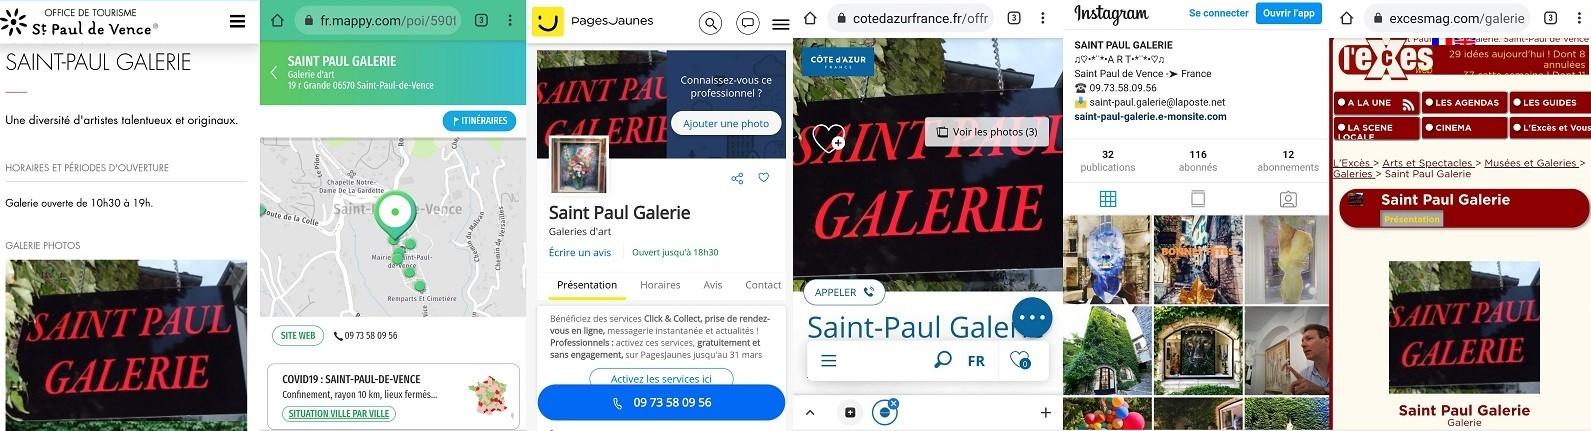 Saint Paul Galerie